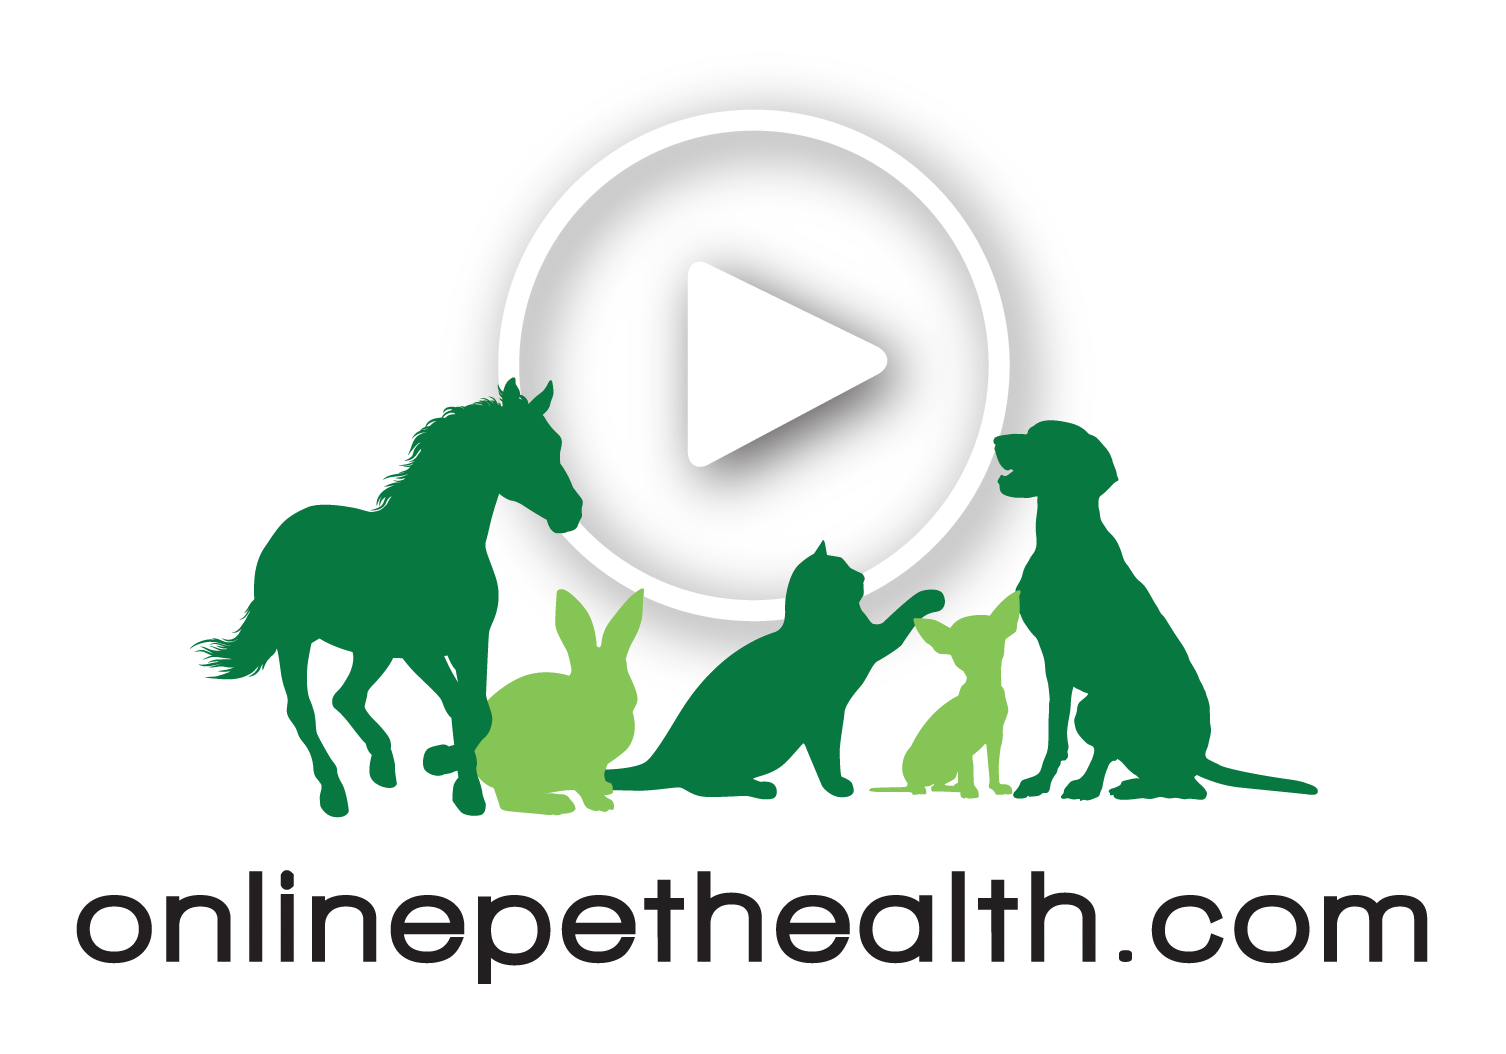 Onlinepethealth Logo Transparent